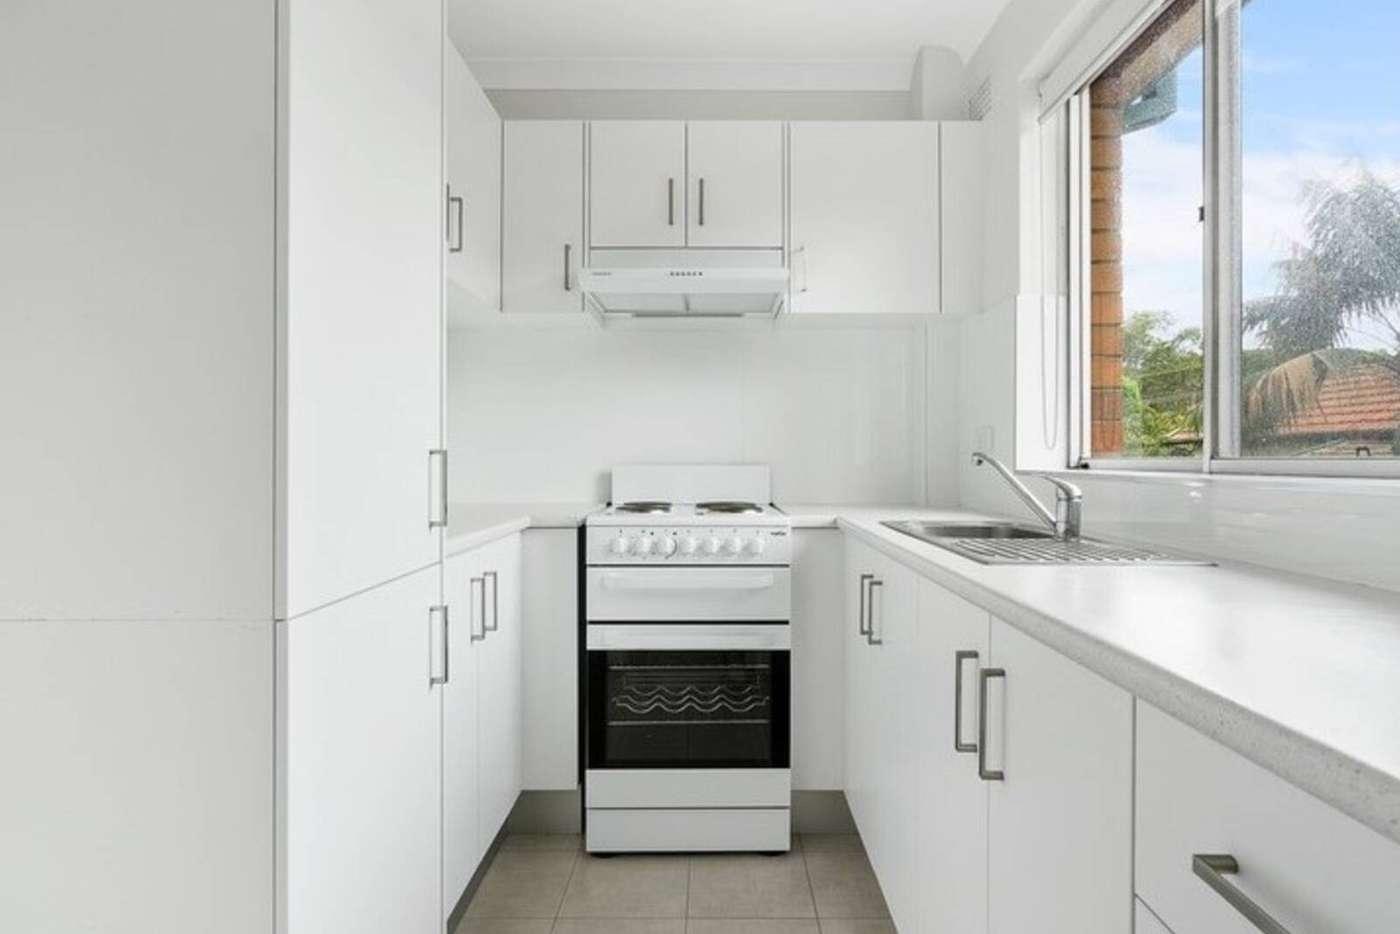 Main view of Homely studio listing, 8/5 Roseville Avenue, Roseville NSW 2069